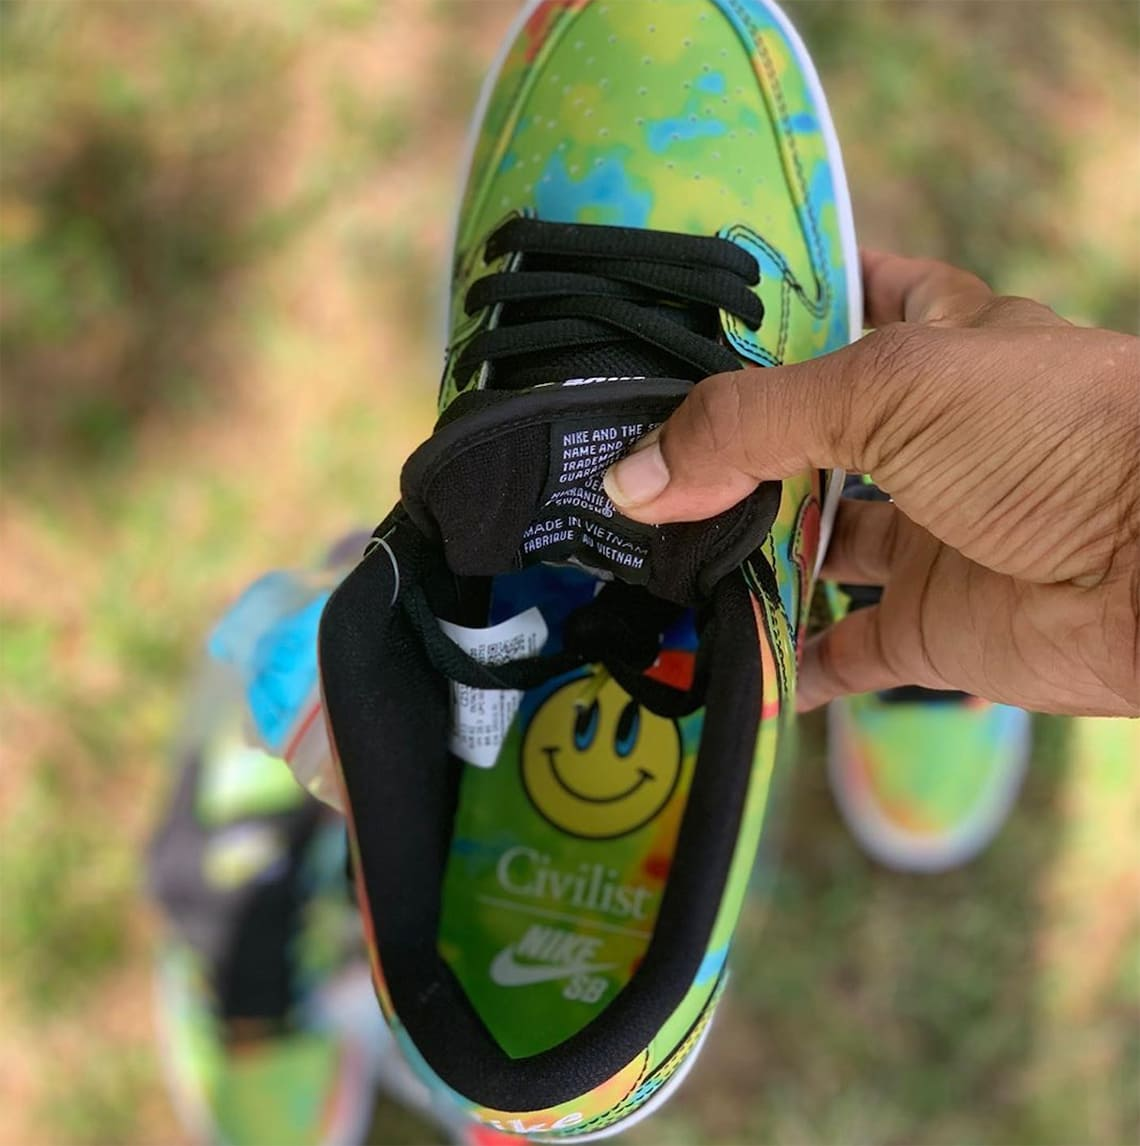 Civilist-Nike-SB-Dunk-Low-Black-CZ5123-001